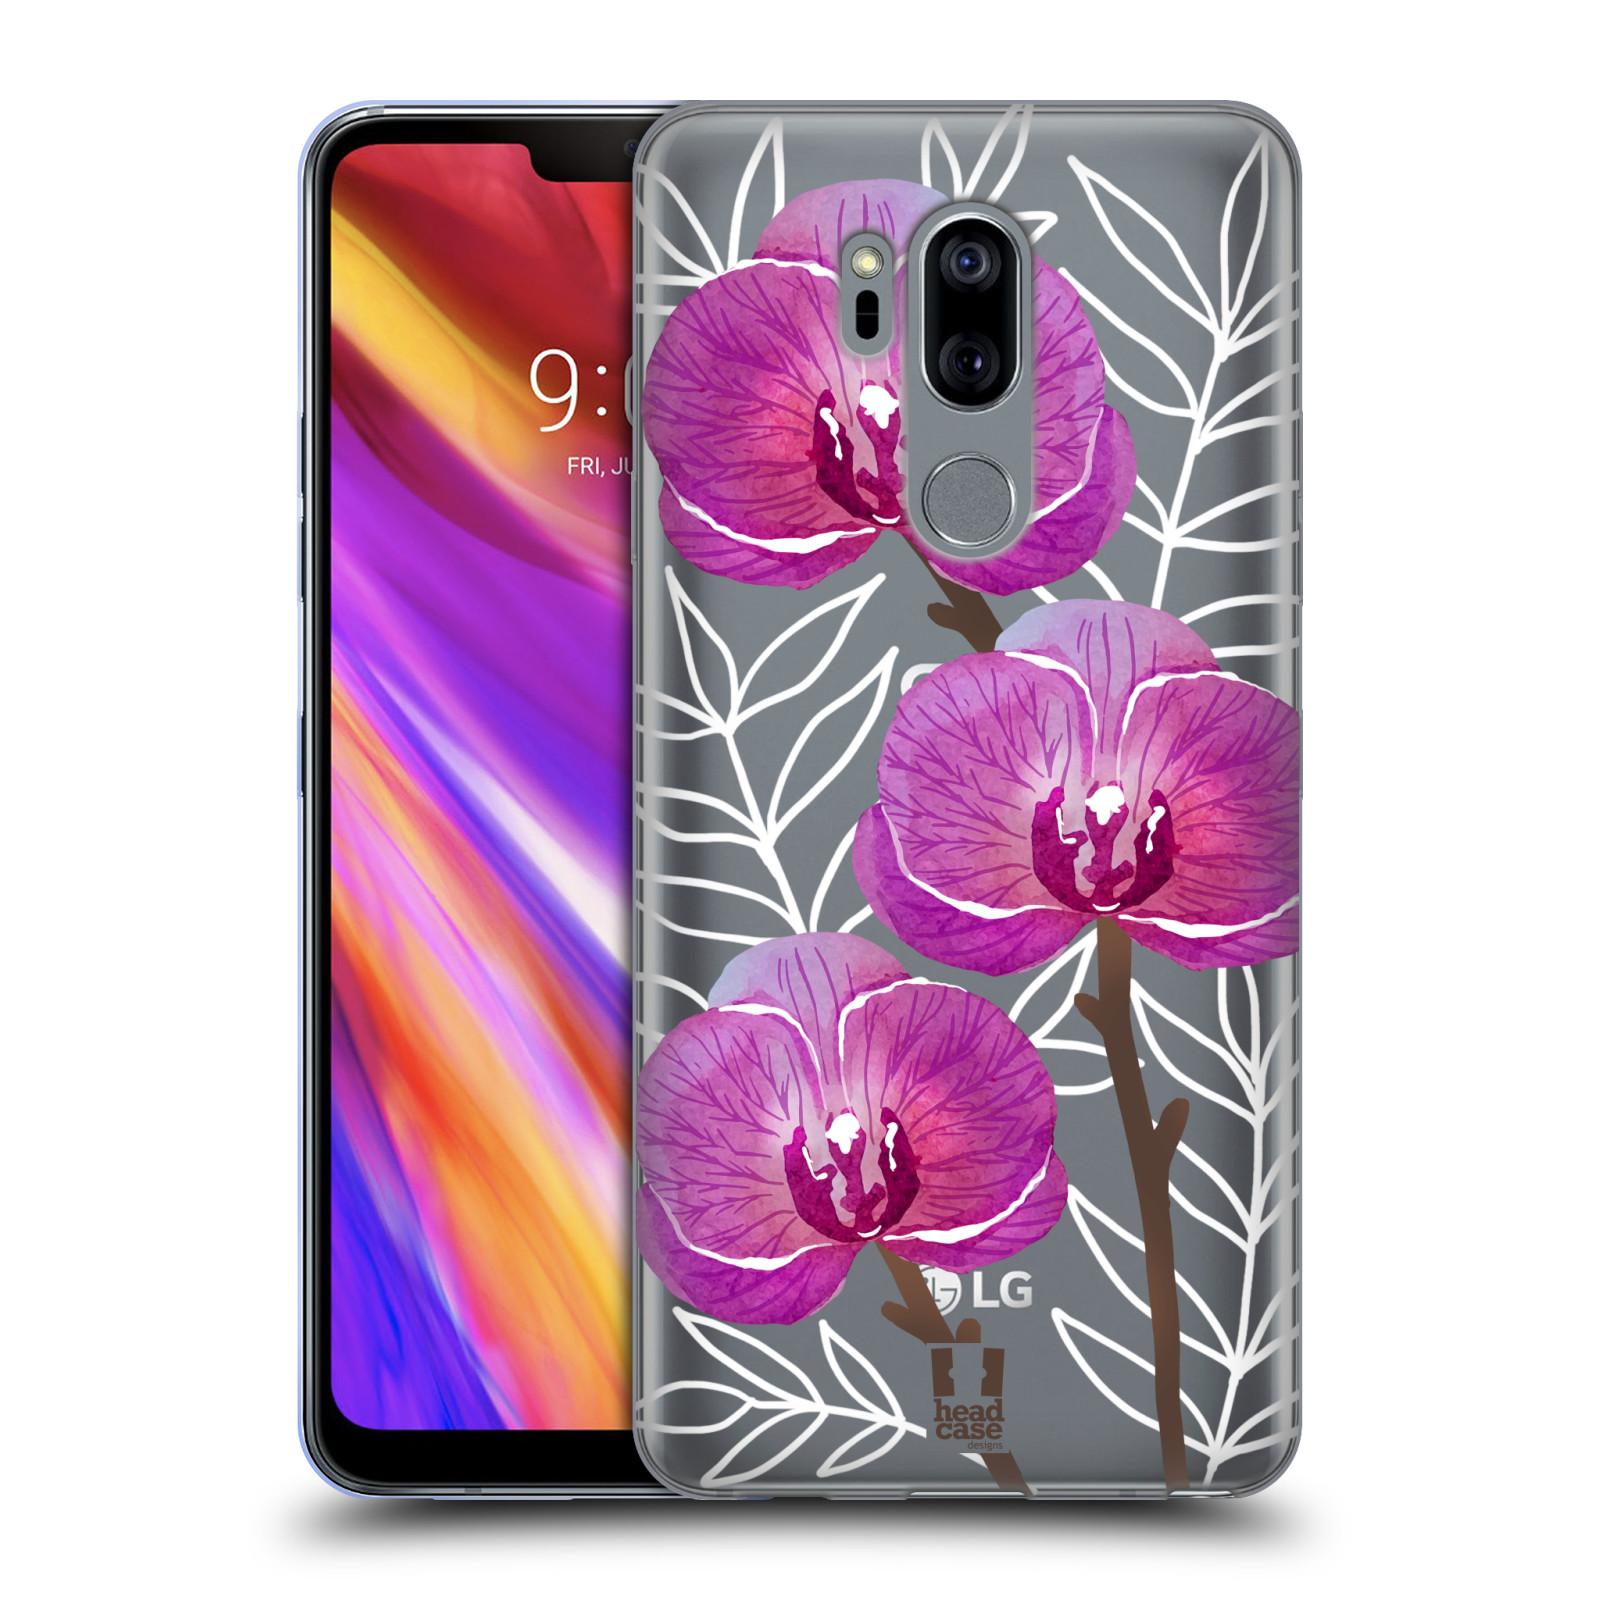 Silikonové pouzdro na mobil LG G7 ThinQ - Head Case - Hezoučké kvítky - průhledné